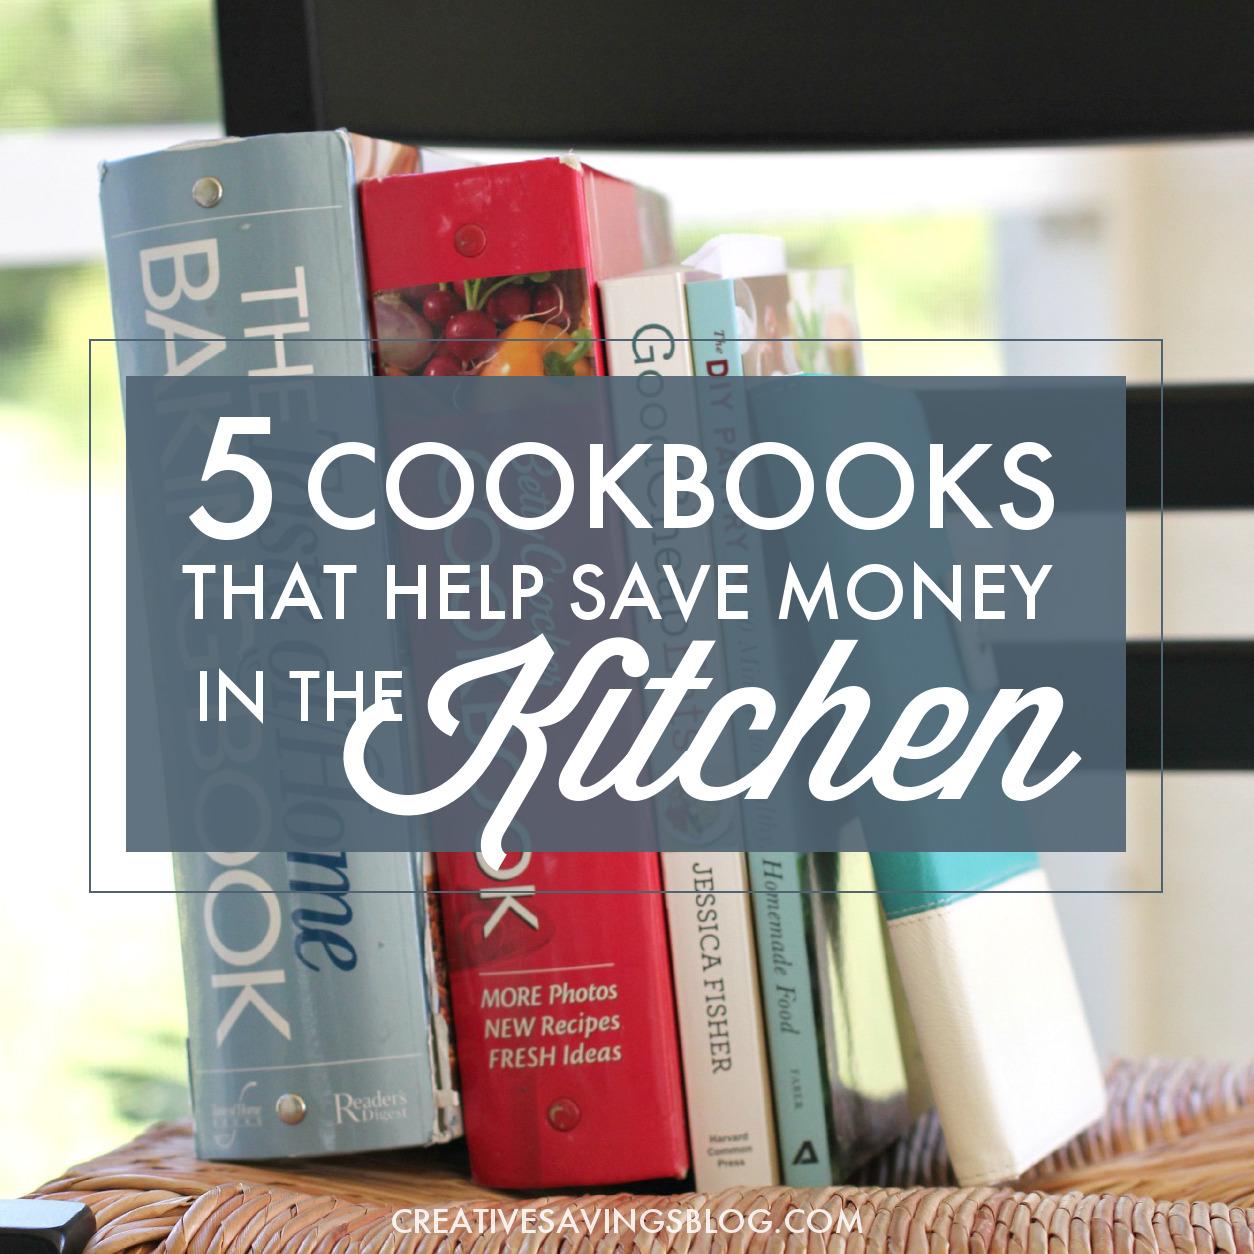 5 Cookbooks that Help Save Money in the Kitchen